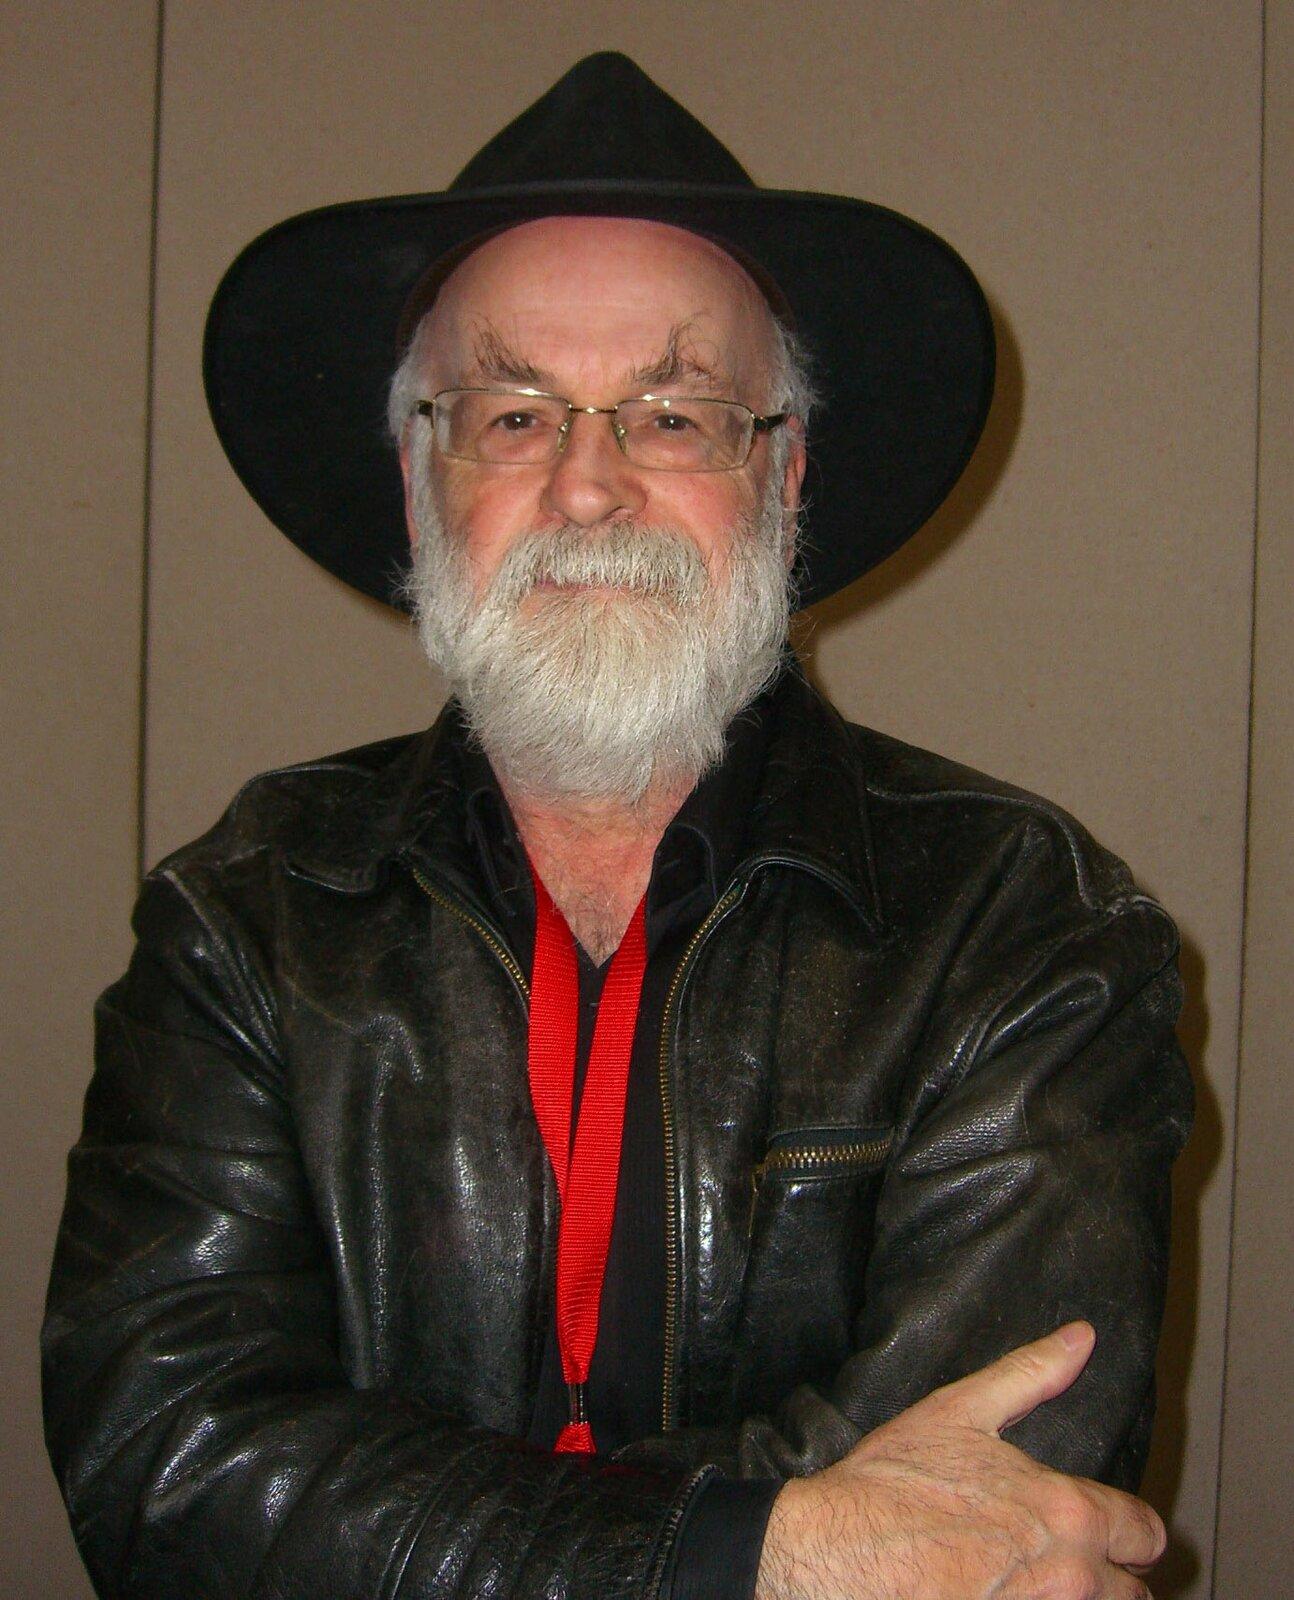 Terry Pratchett Źródło: Luigi Novi, Terry Pratchett, fotografia.